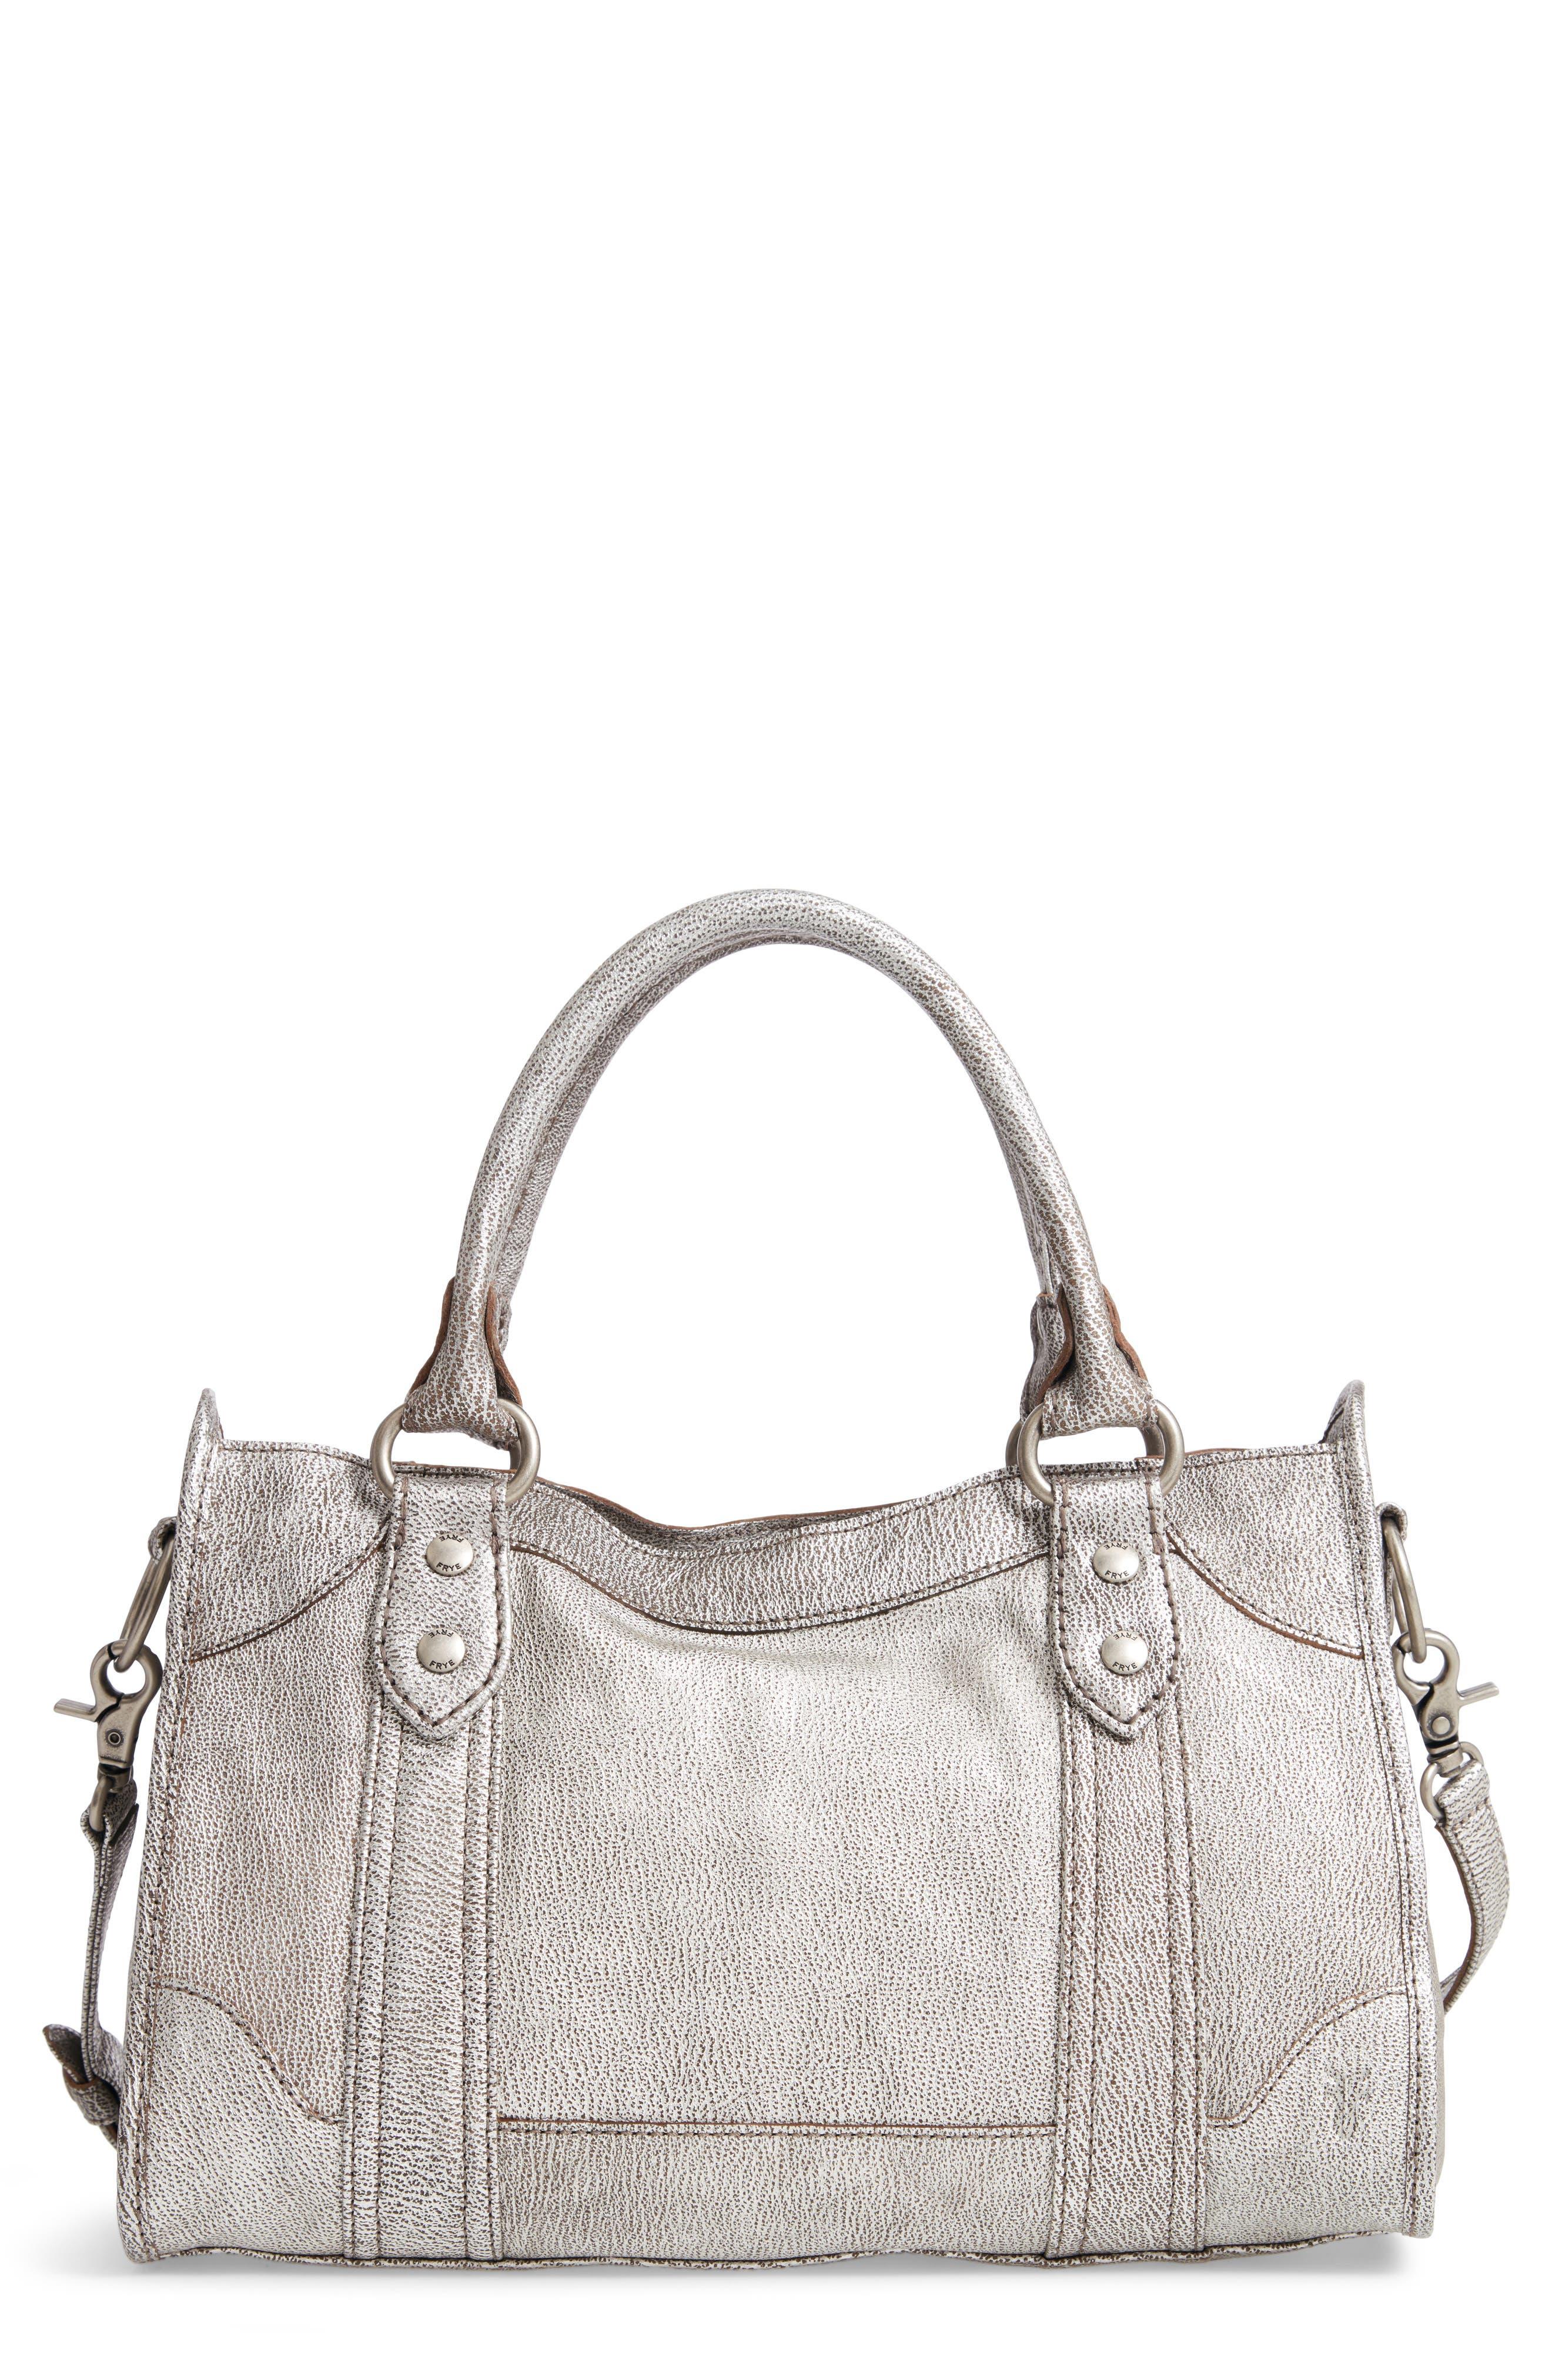 FRYE Melissa Metallic Leather Satchel, Main, color, 040